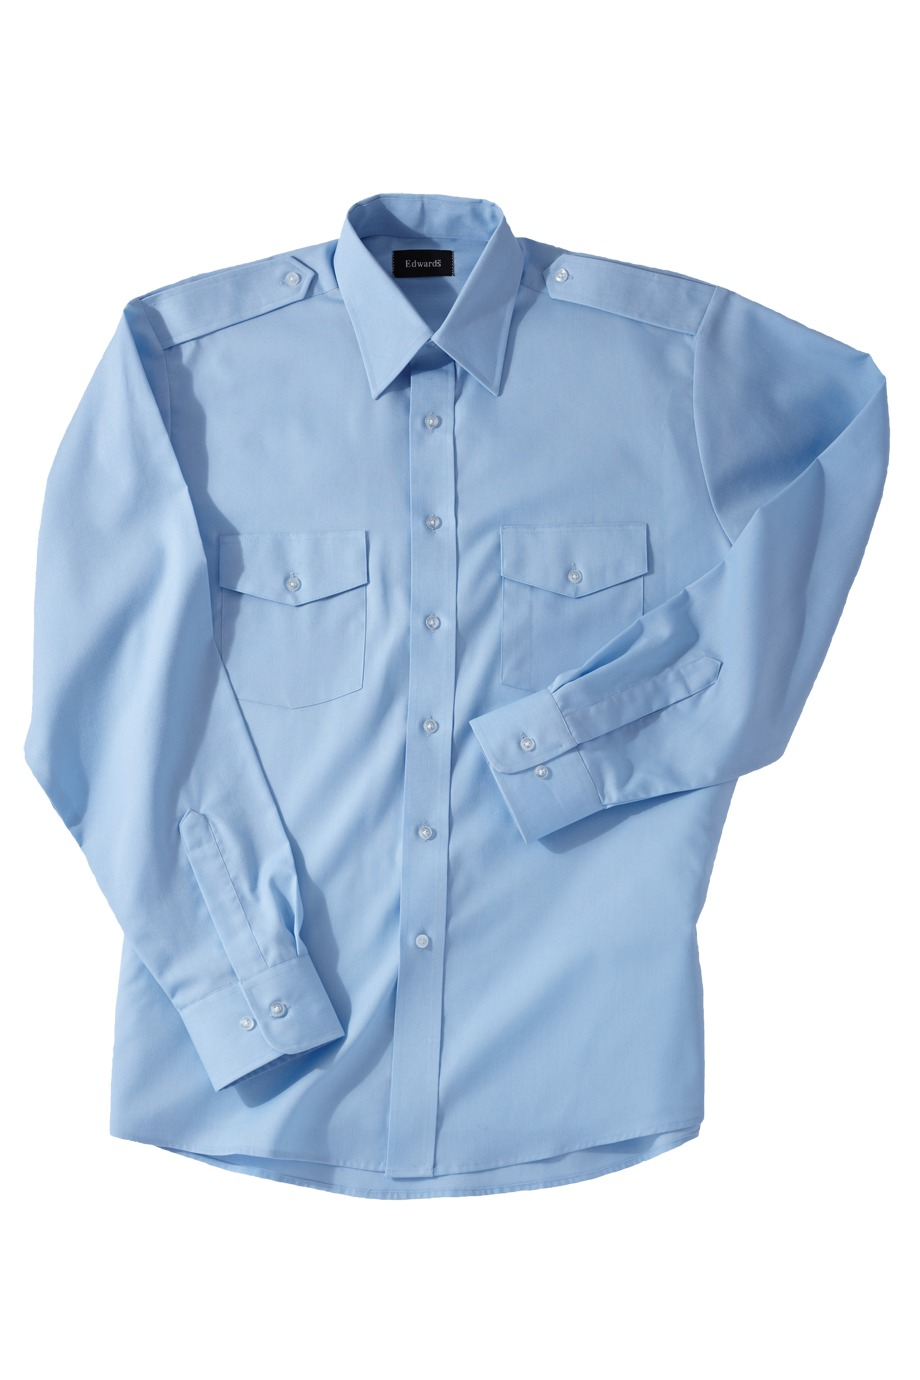 Edwards Garment 1262 - Men's Long Sleeve Navigator Shirt